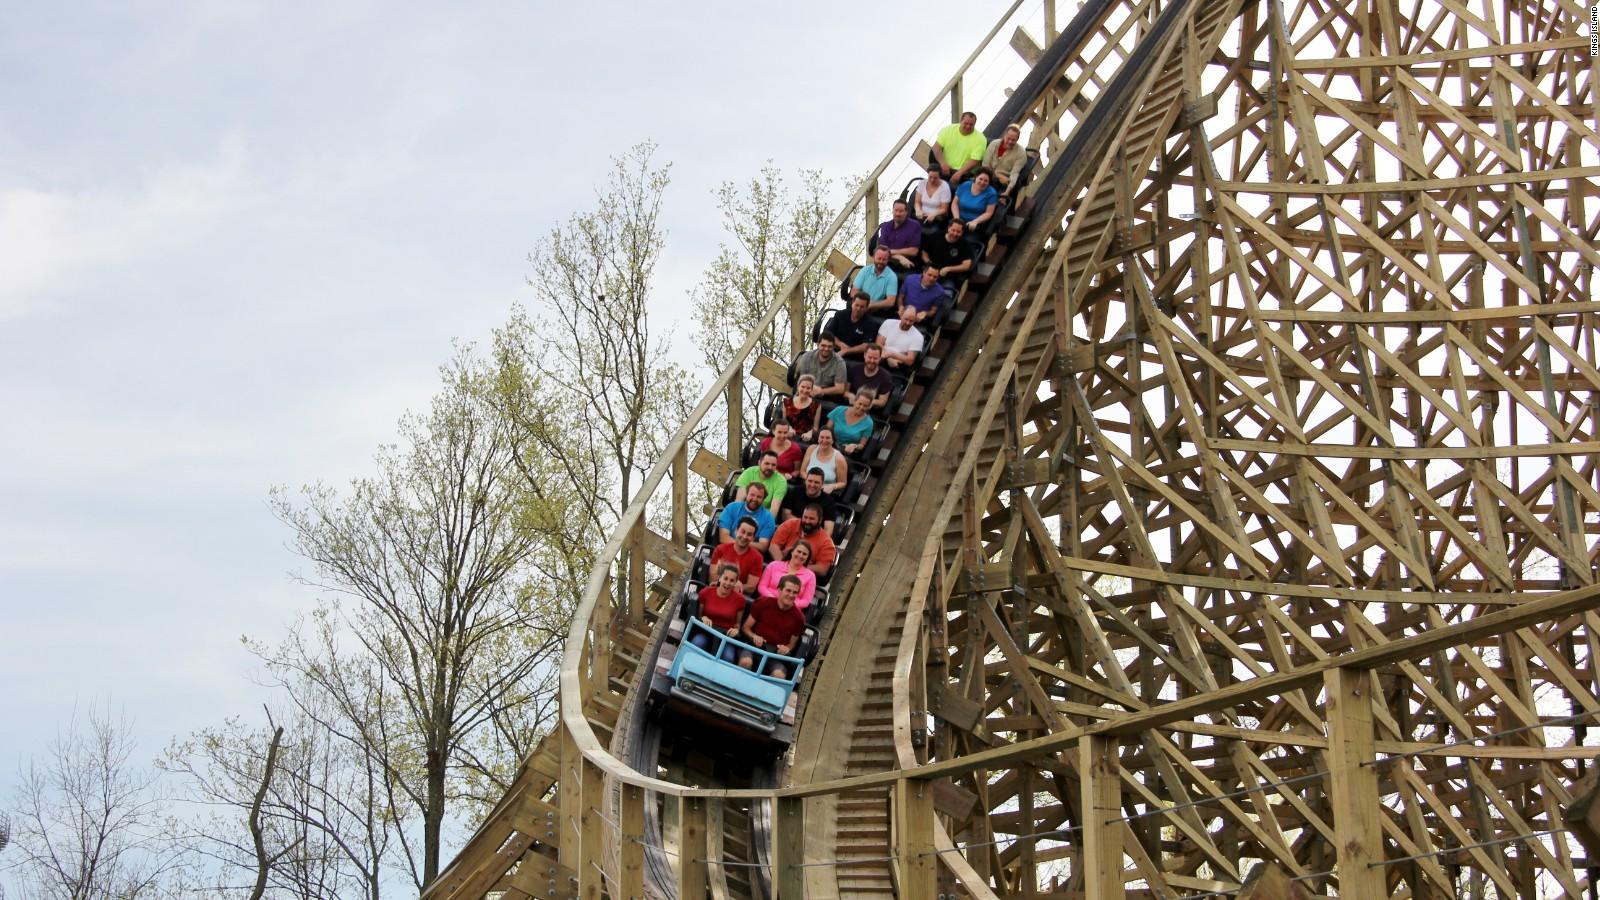 a roller coaster fanatic's 10 picks | cnn travel